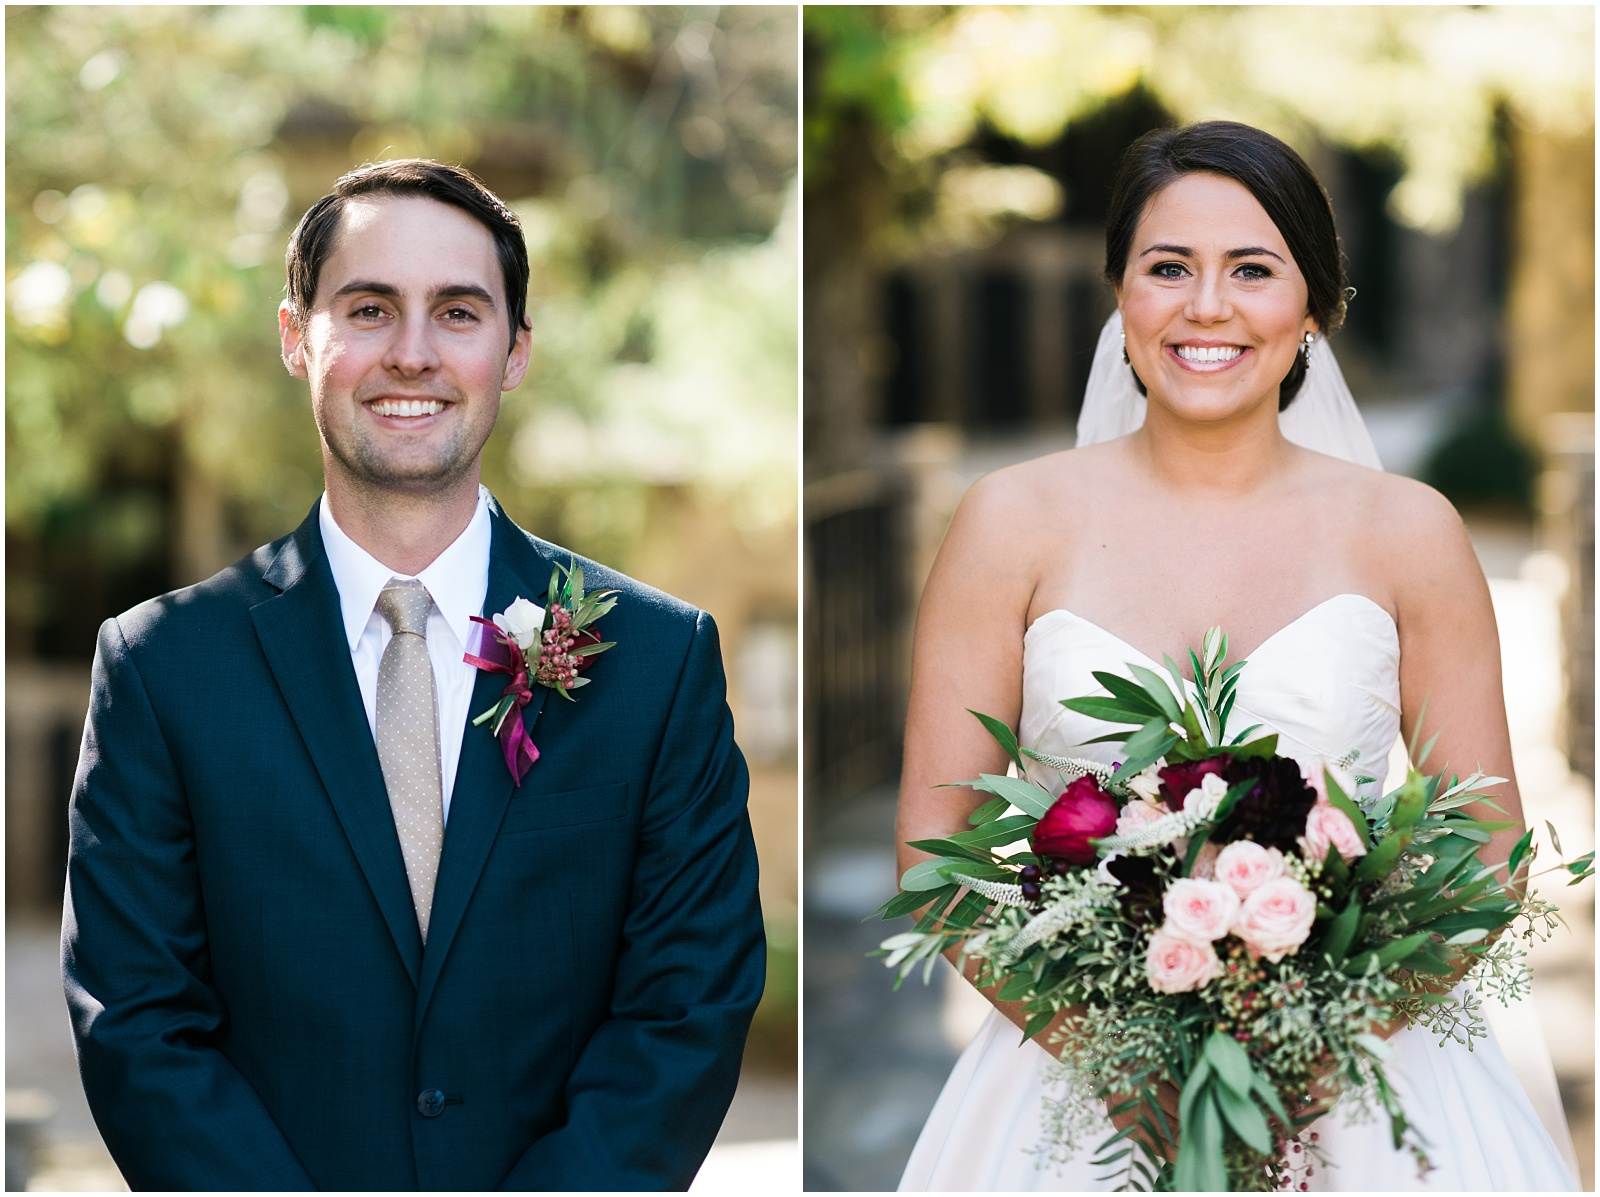 Bride and groom closeup portraits